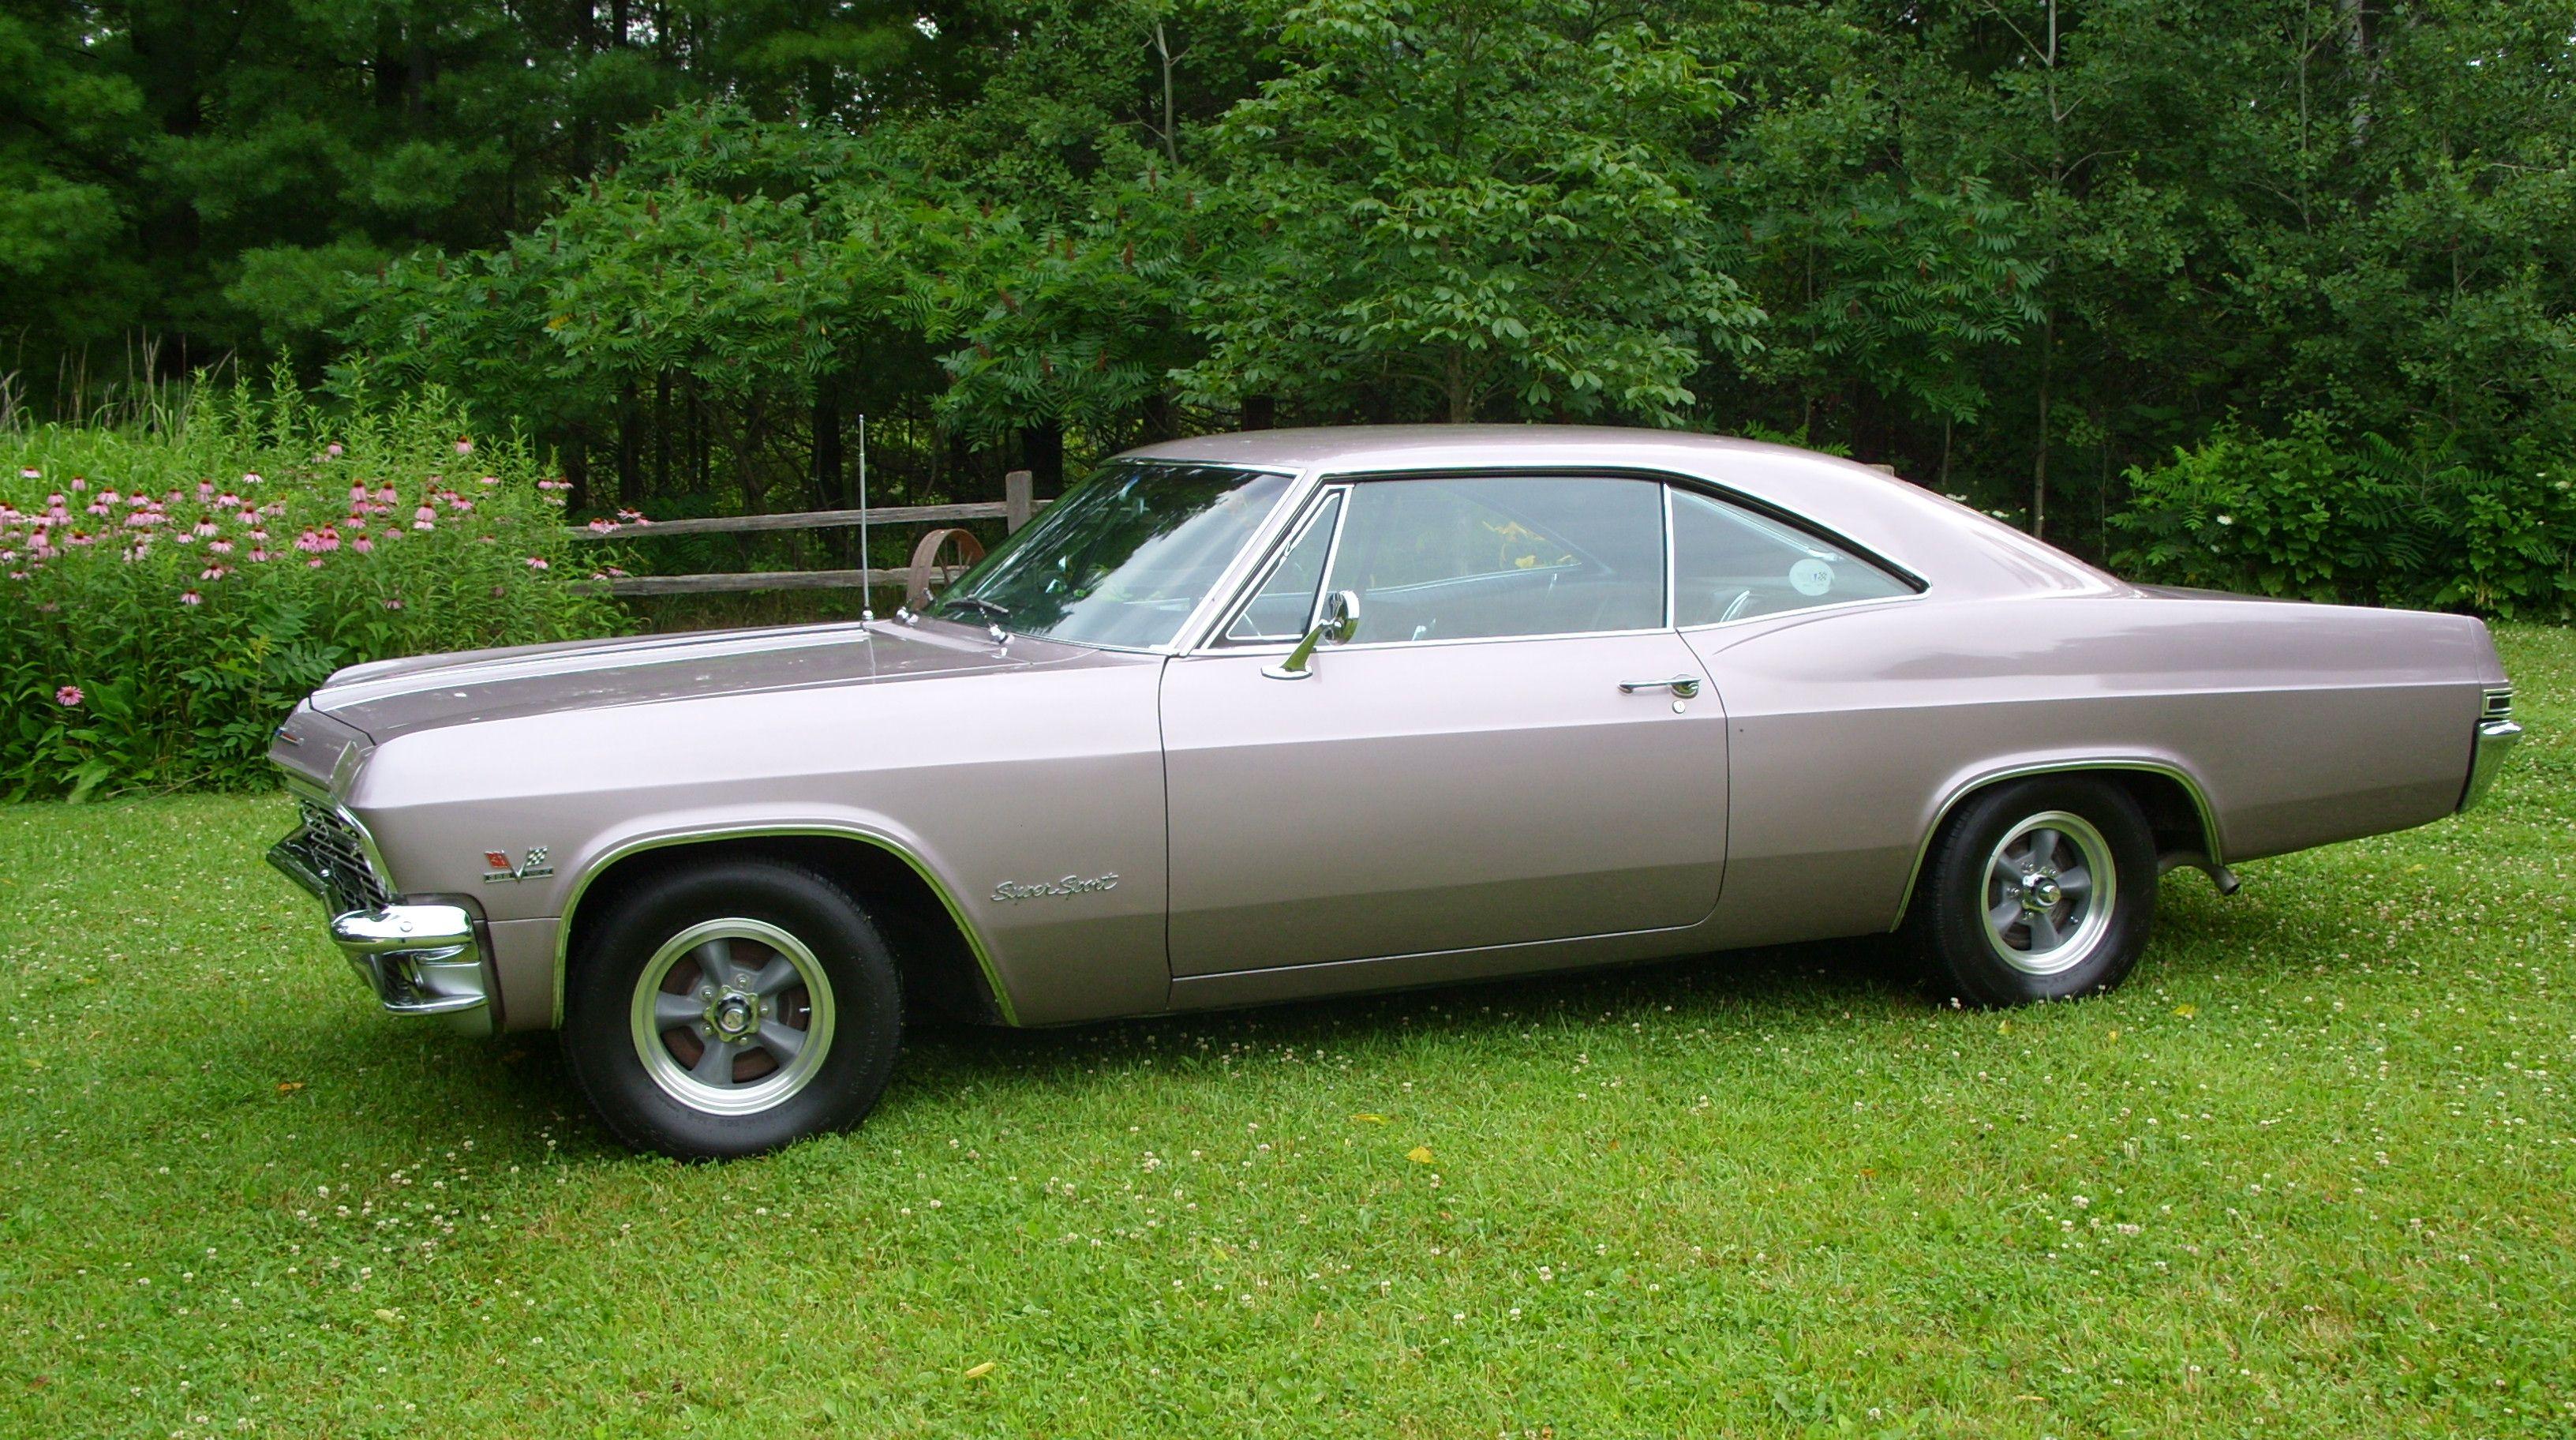 1963 chevrolet impala home vehicles 1963 chevrolet impala series places to visit pinterest chevy impala ss impalas and chevy impala